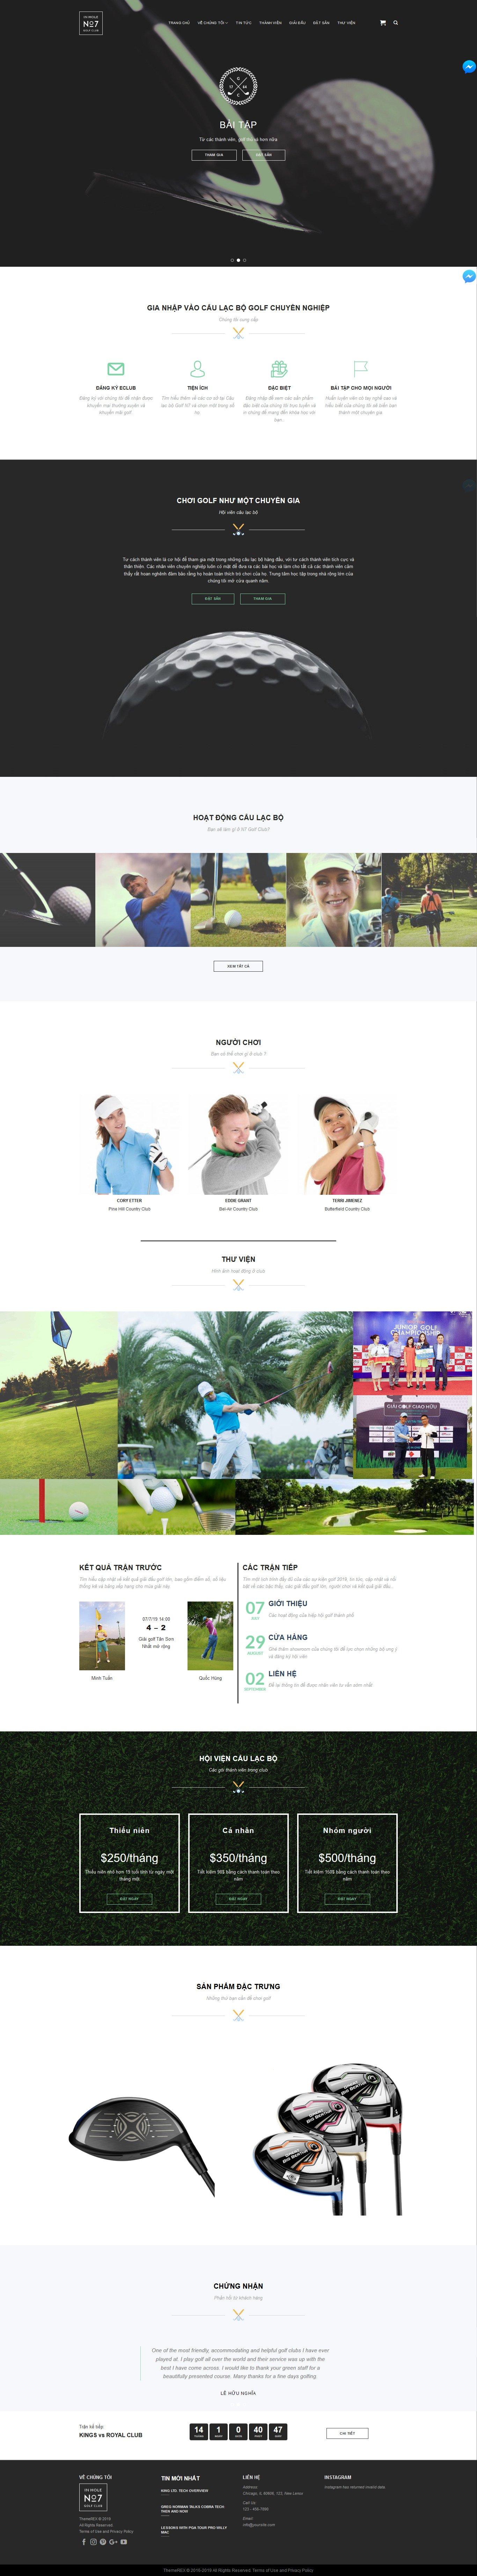 Mẫu website giới thiệu sân golf No7